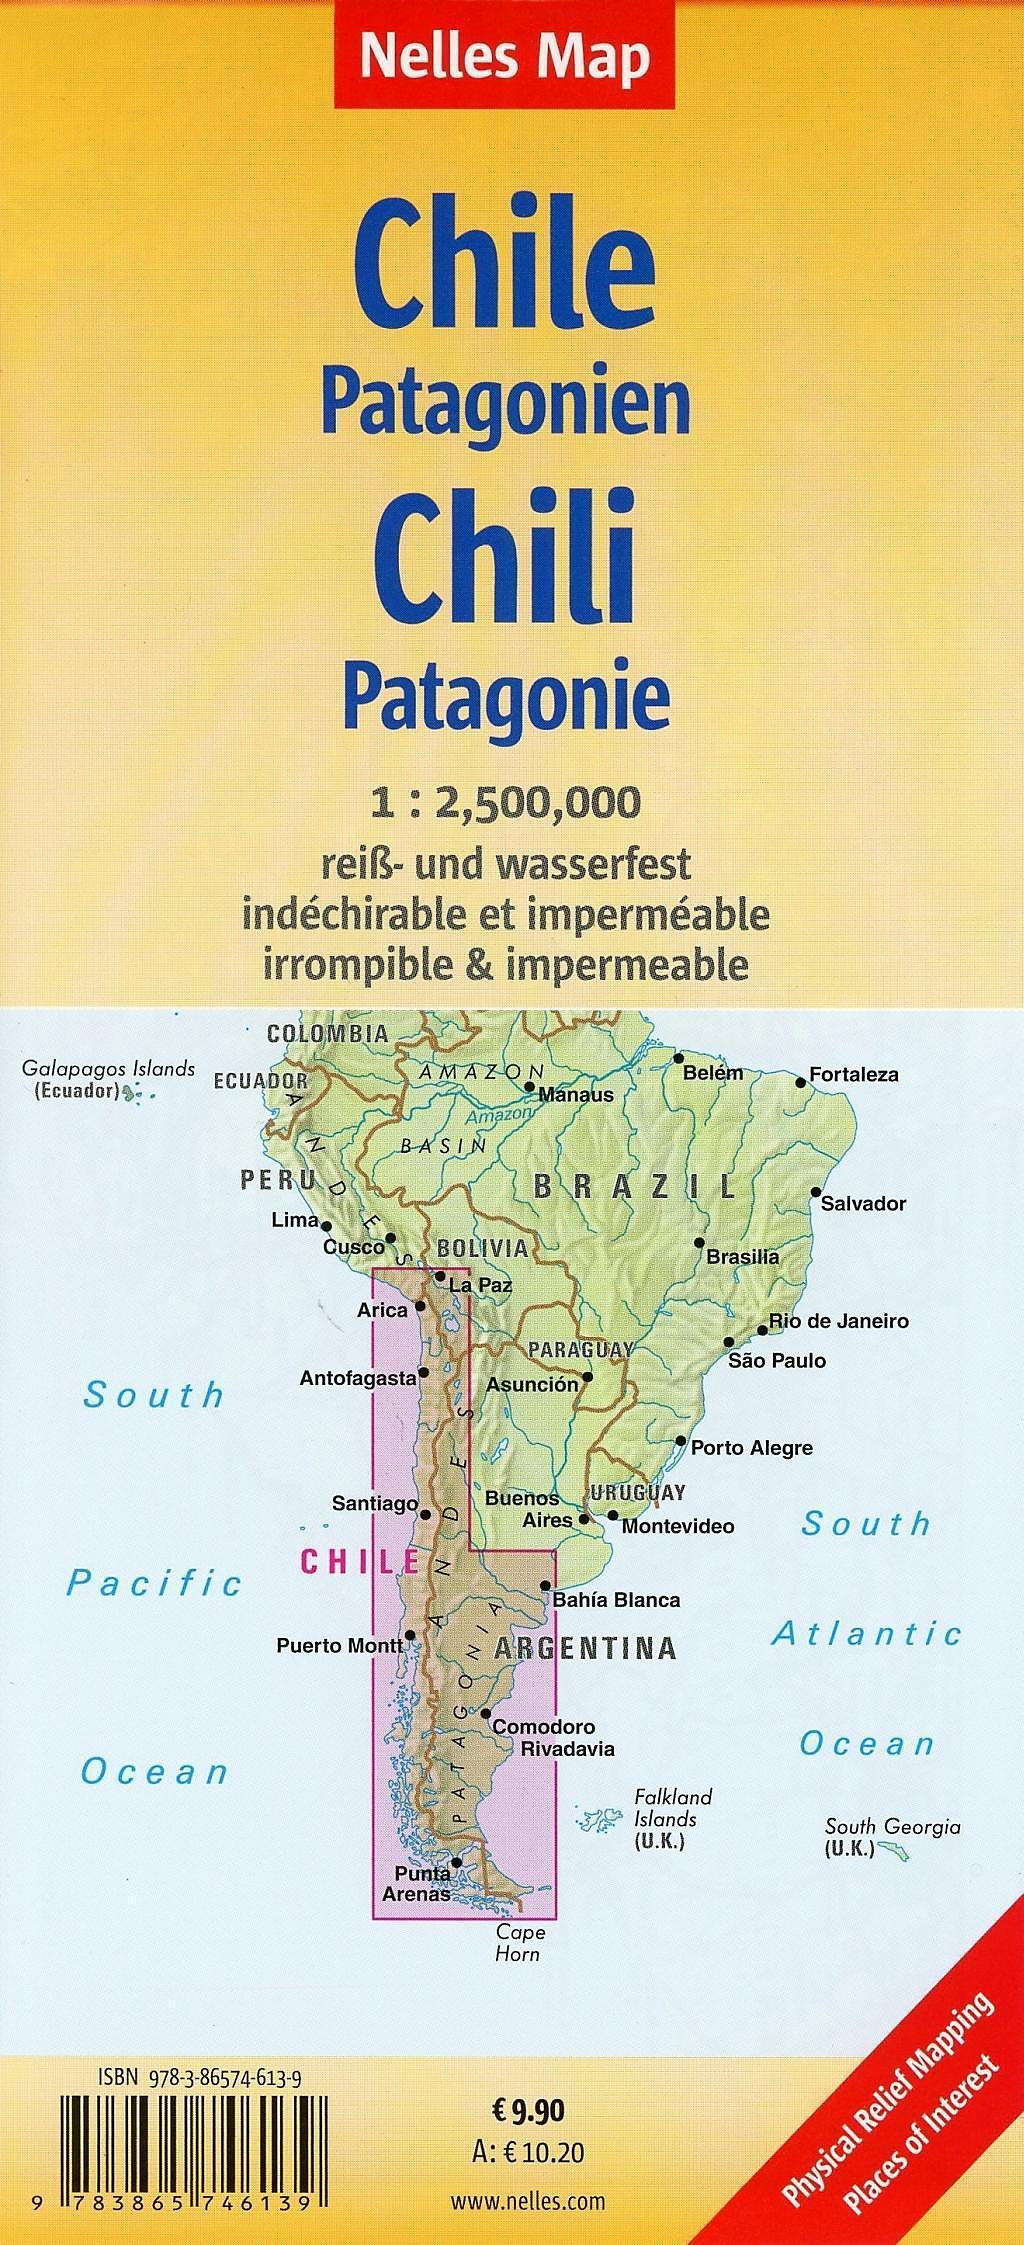 Patagonien Highlights Karte.Nelles Map Landkarte Chile Patagonia Chile Patagonien Chili